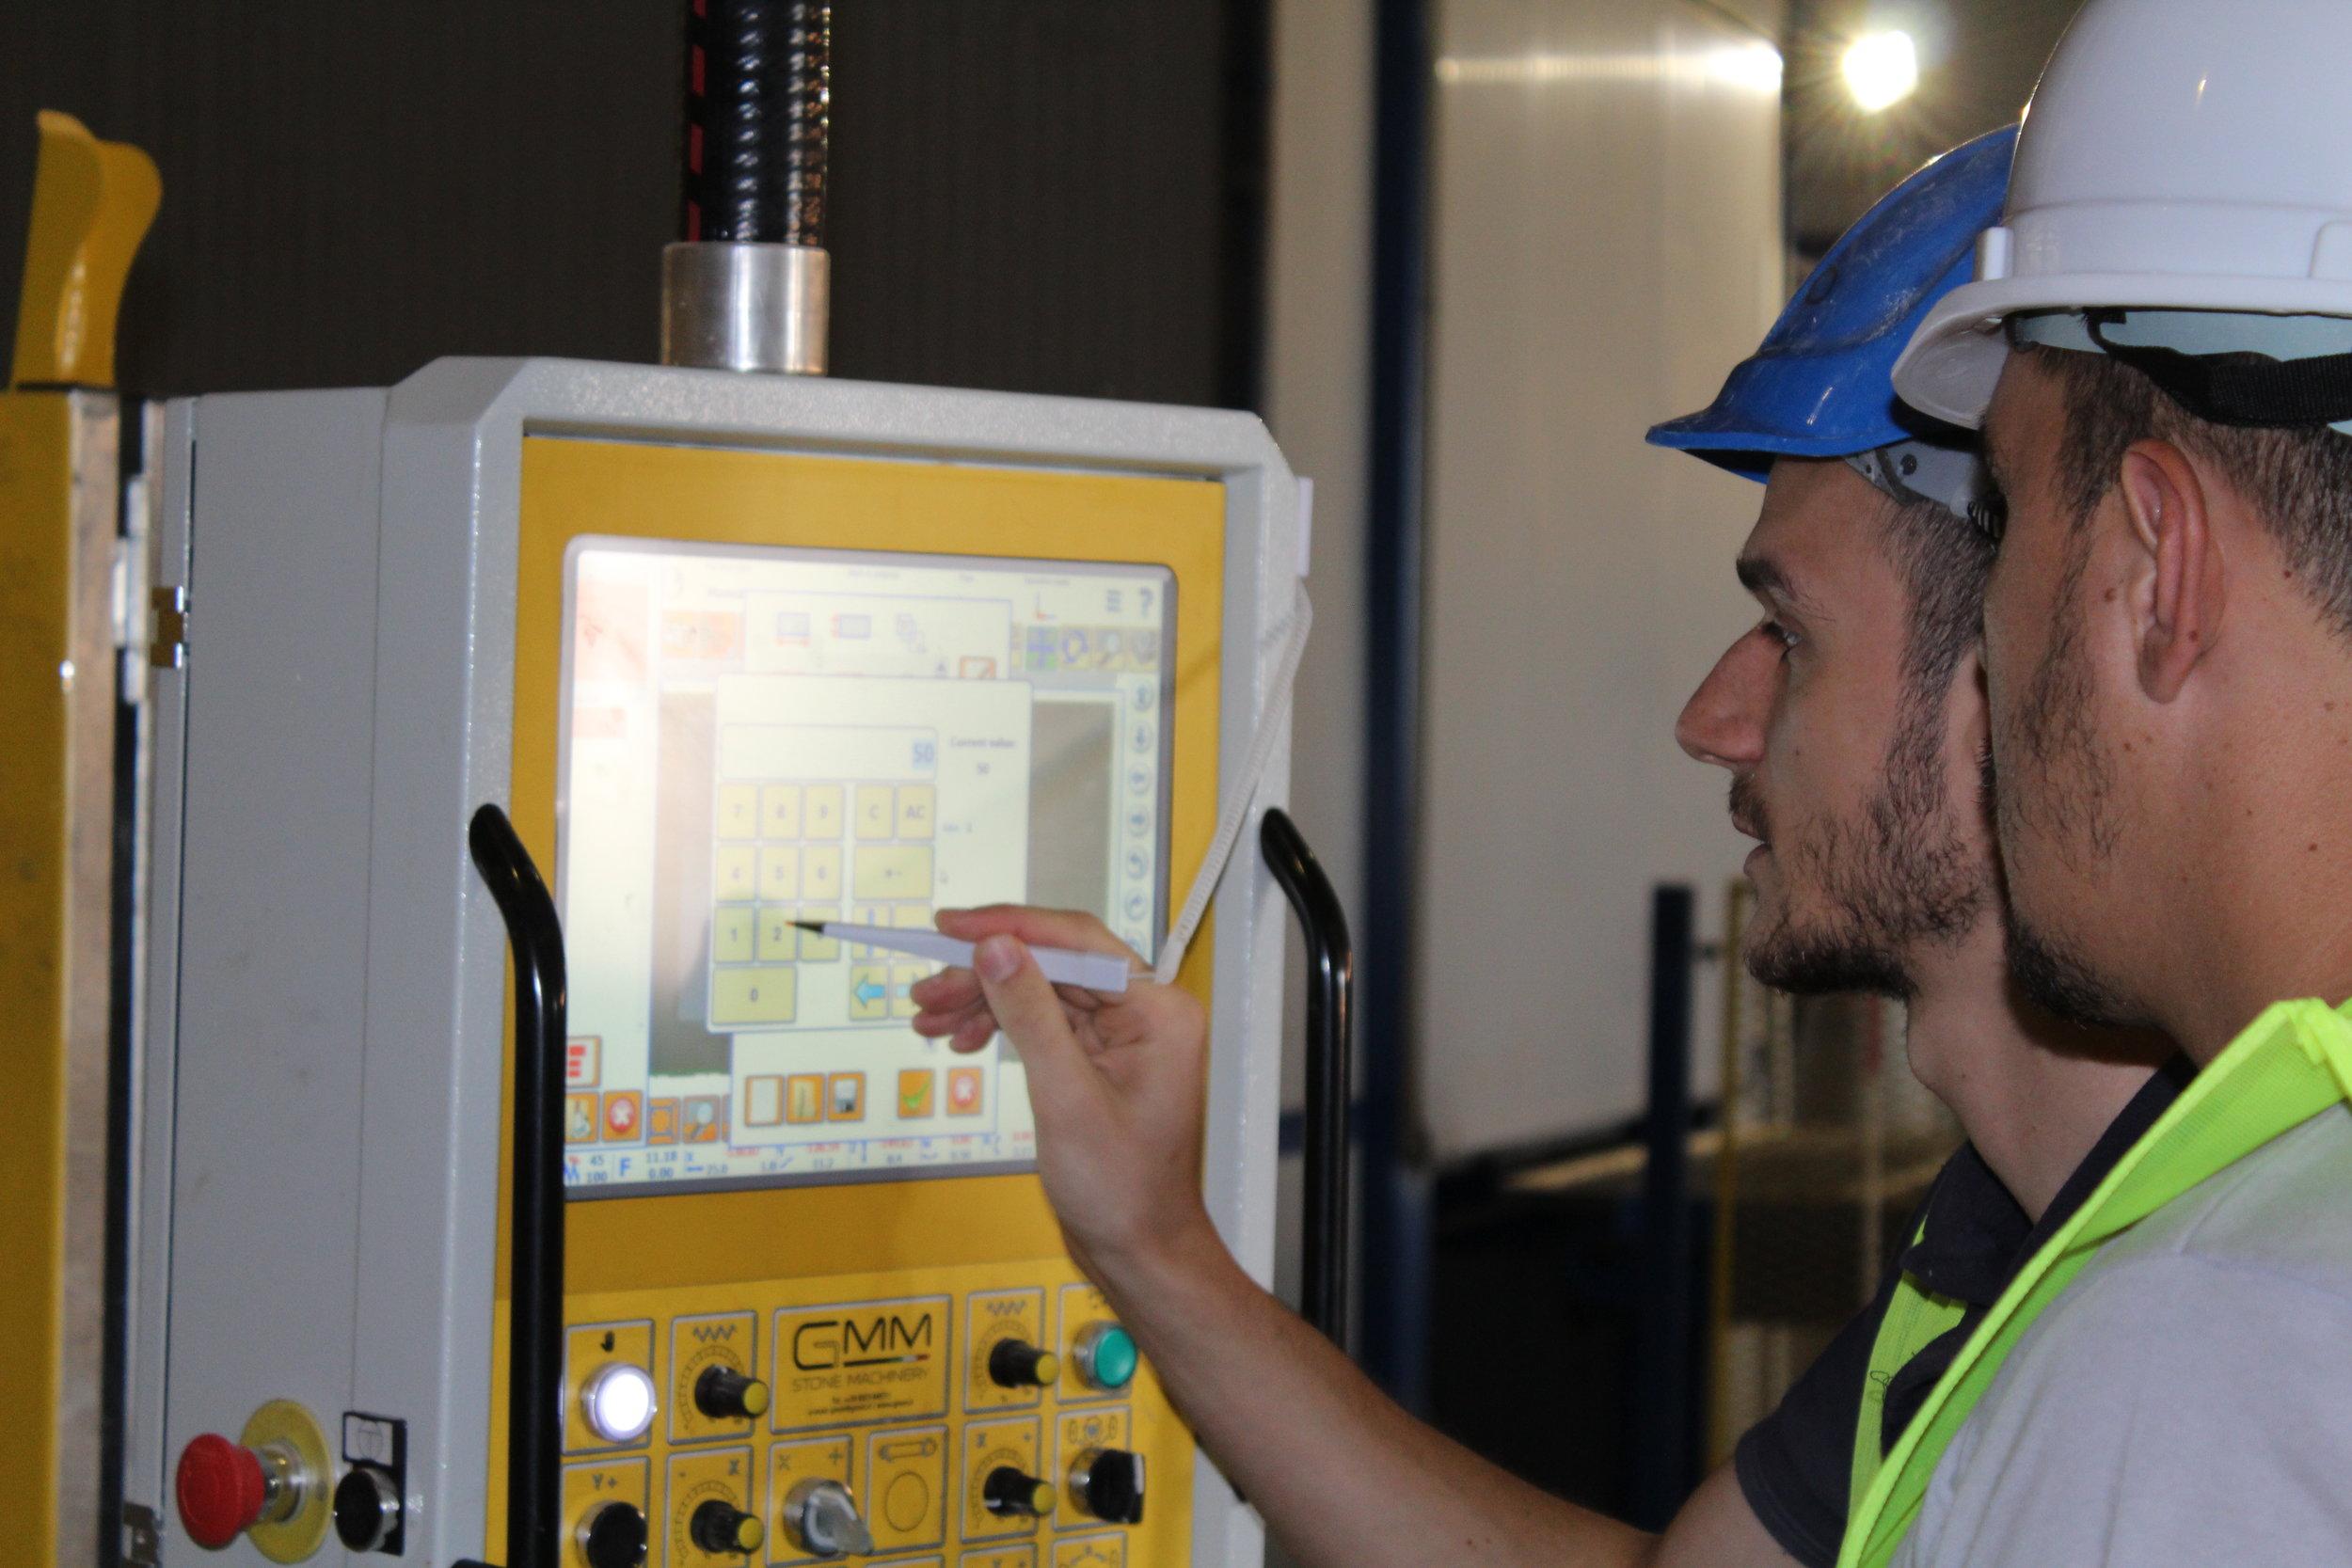 Operating the CNC Machine